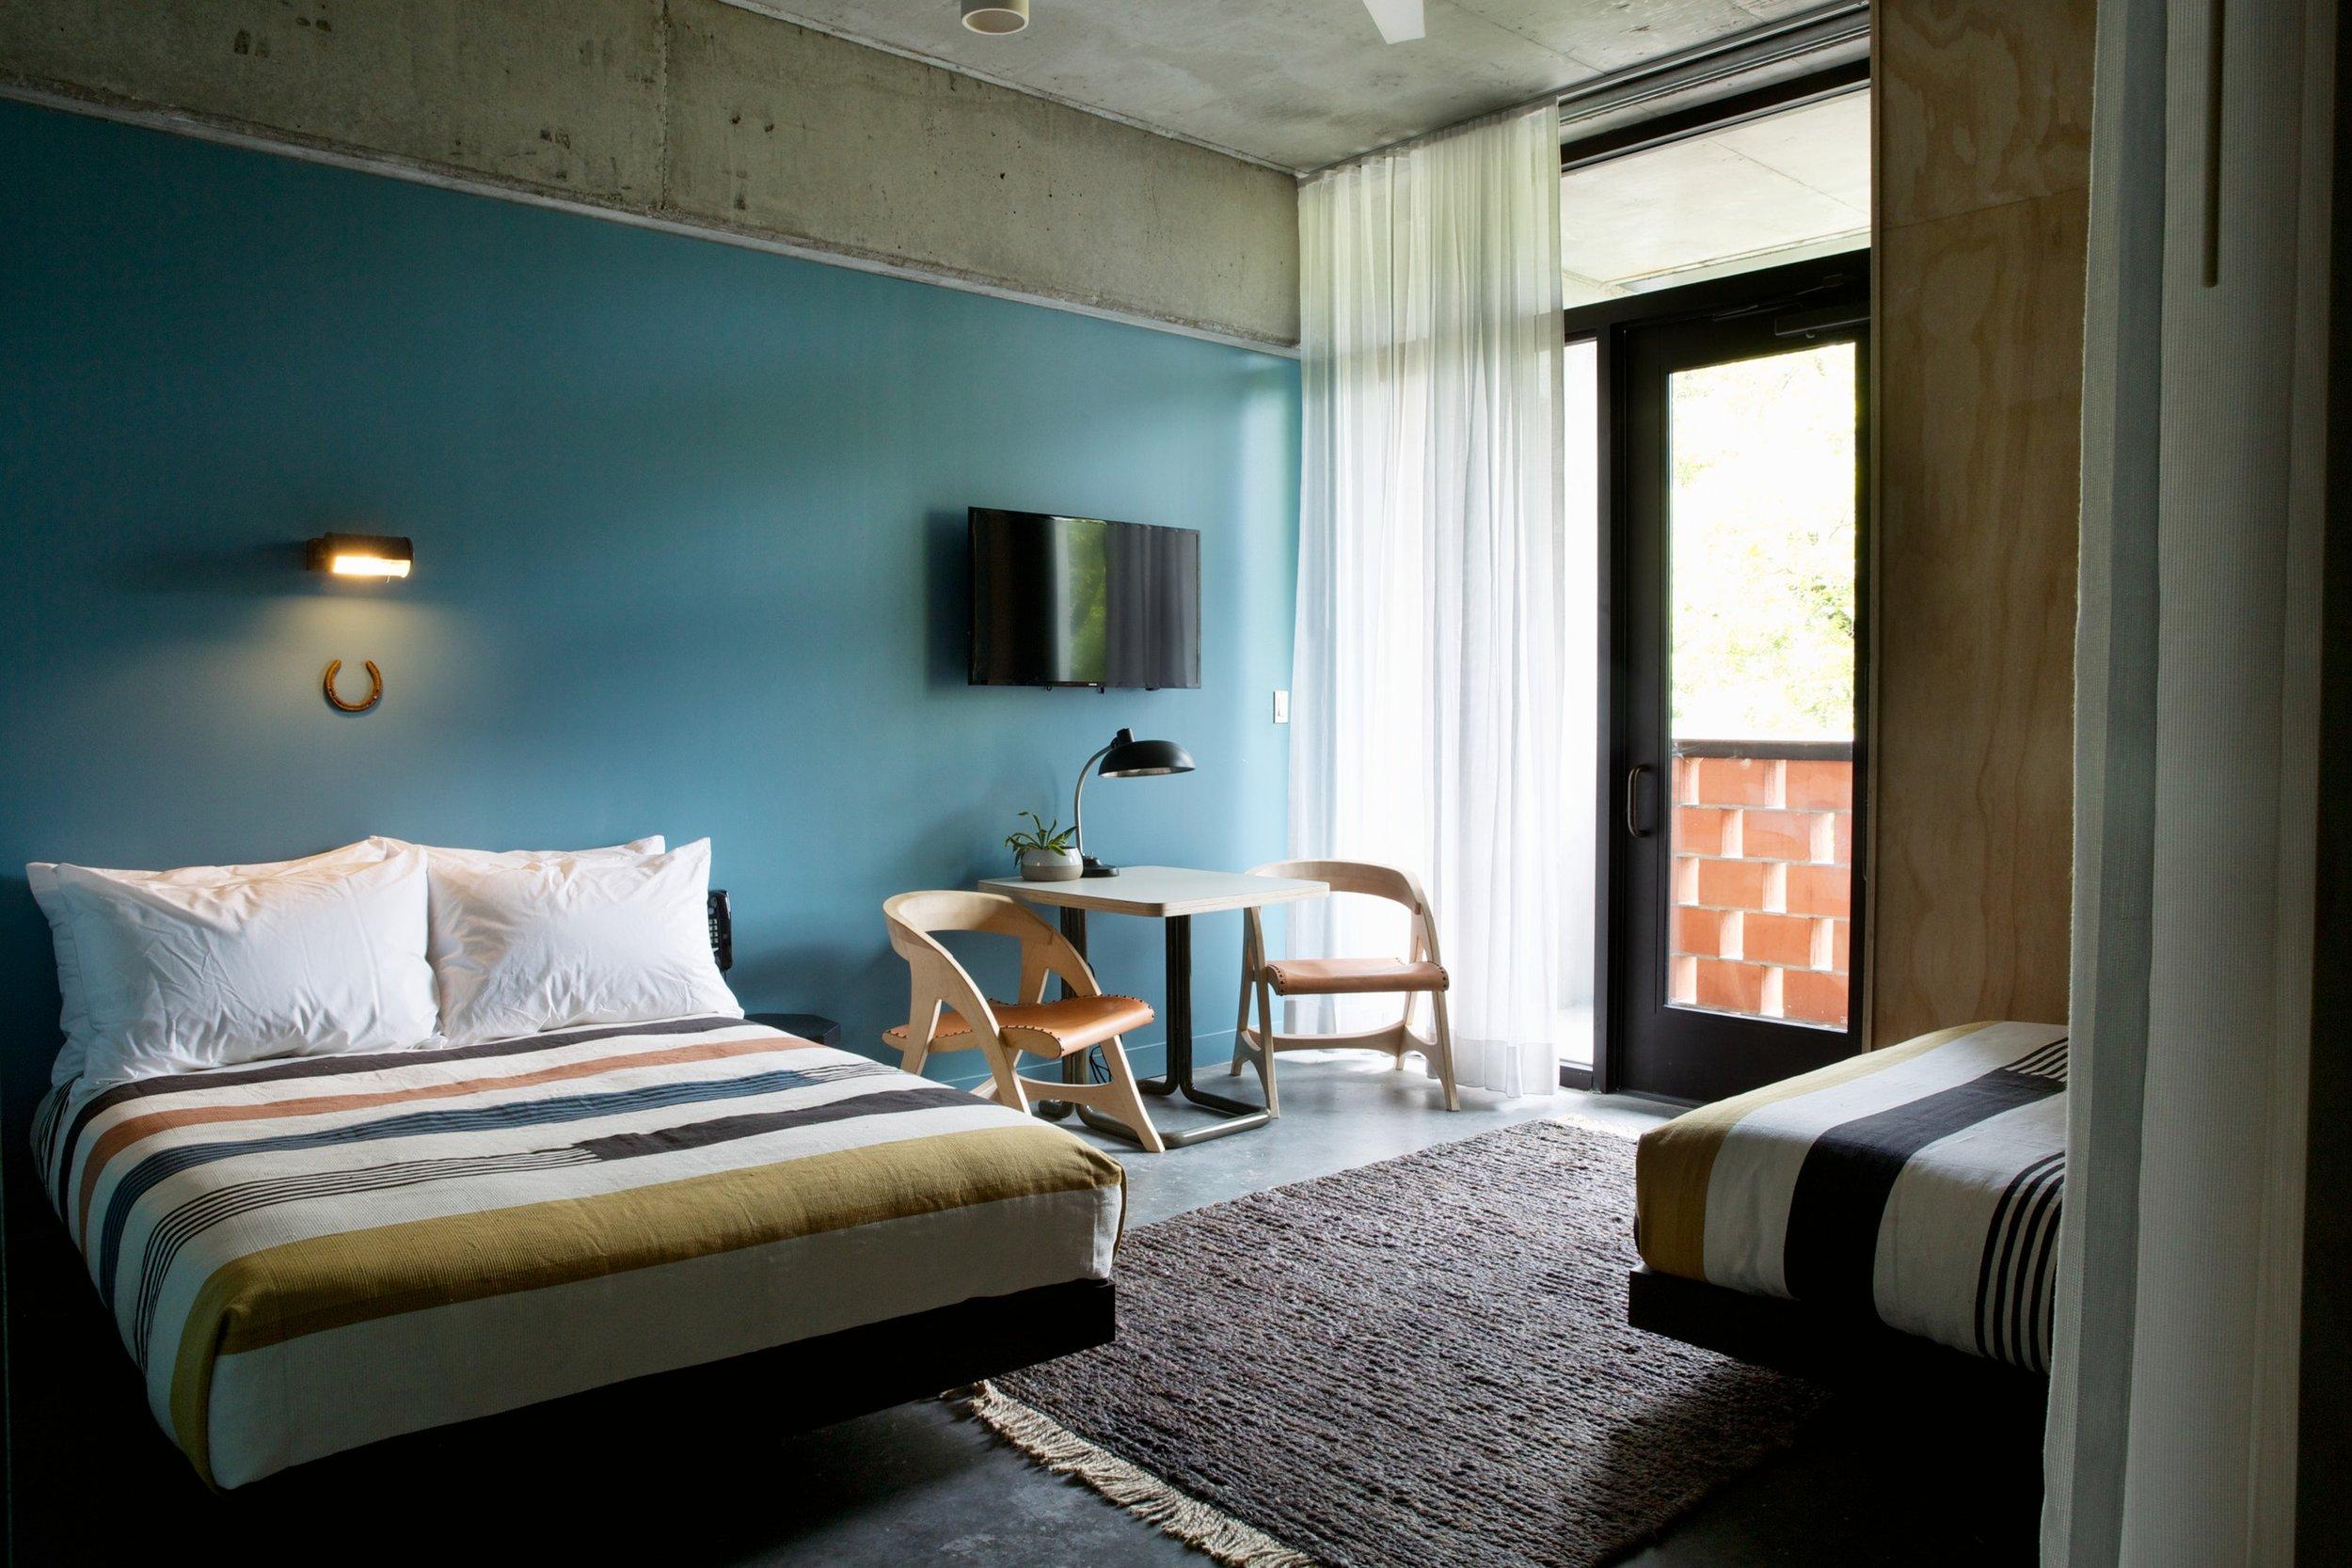 THE_CARPENTER_HOTEL_WEEKEND_AUSTIN_TEXAS2.jpg